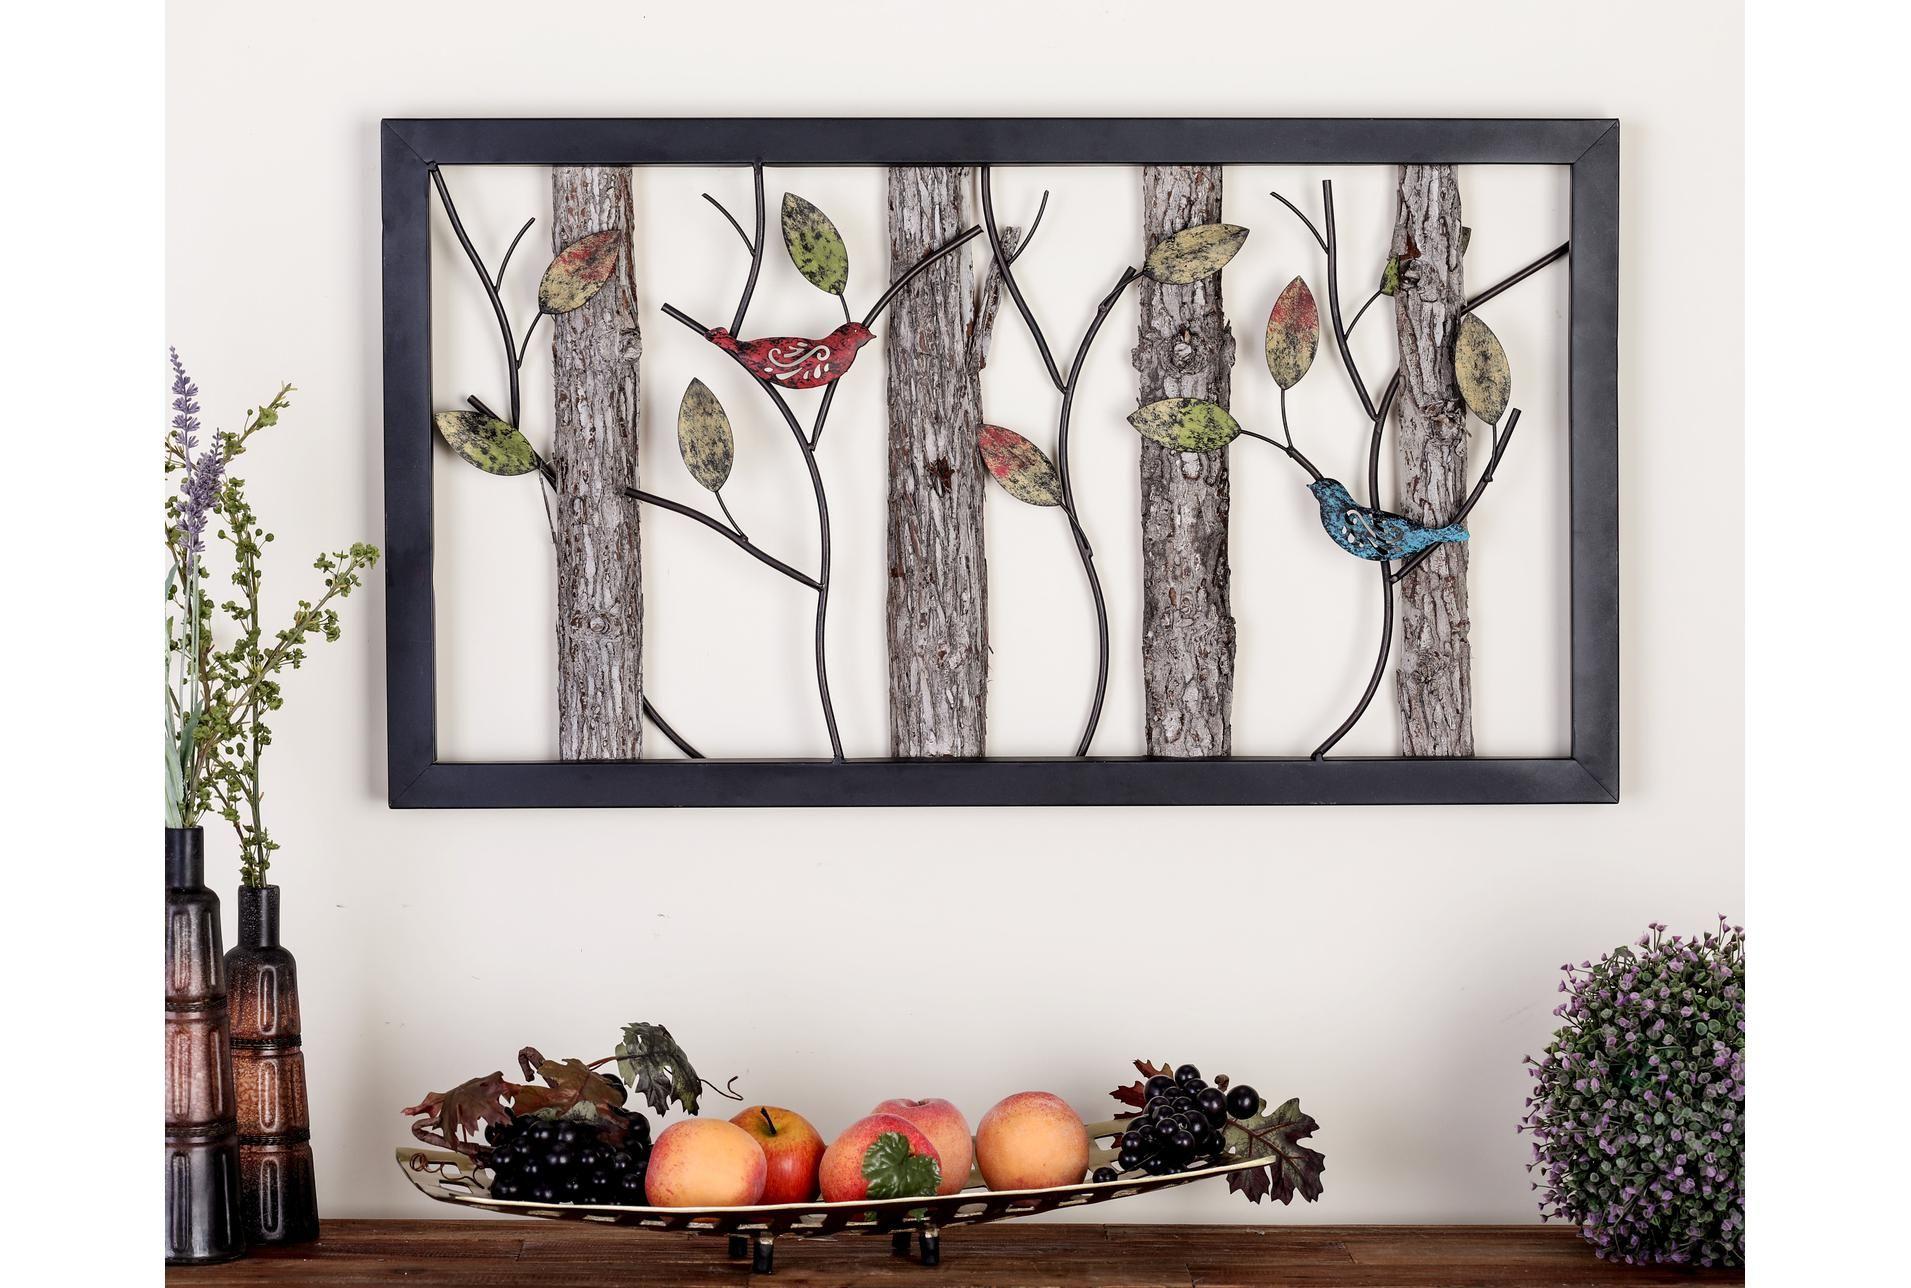 Stunning Fine Art Wall Plaque in Miniature